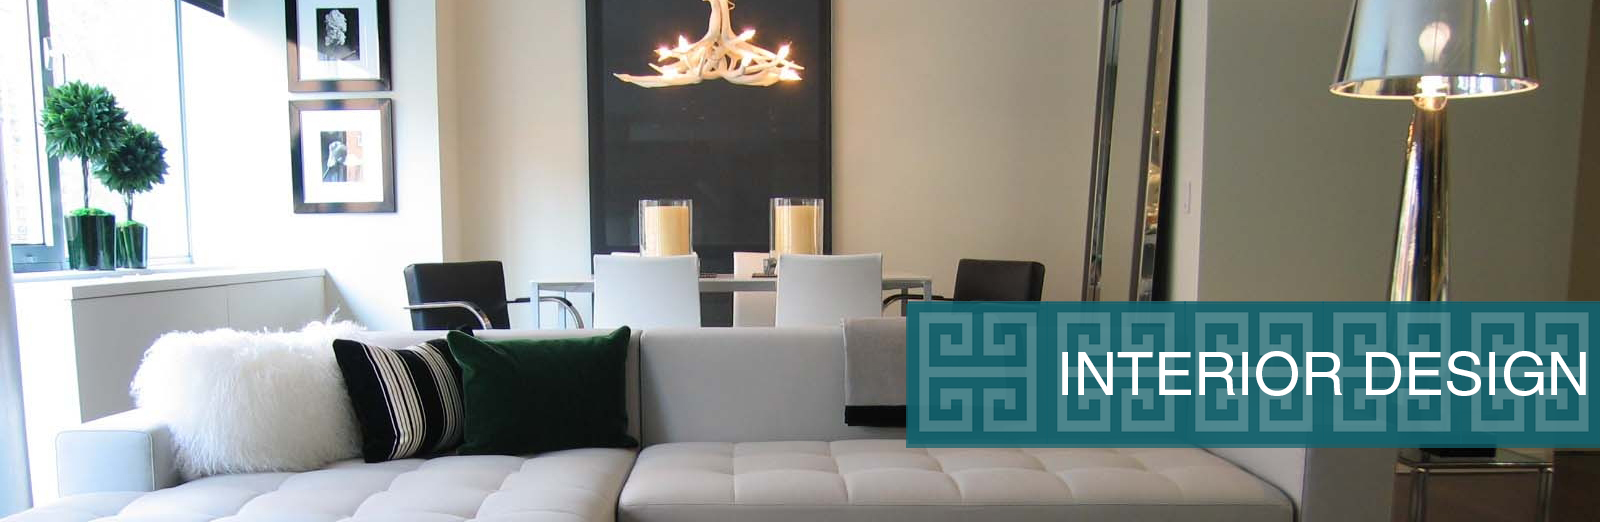 interior design atlanta ga